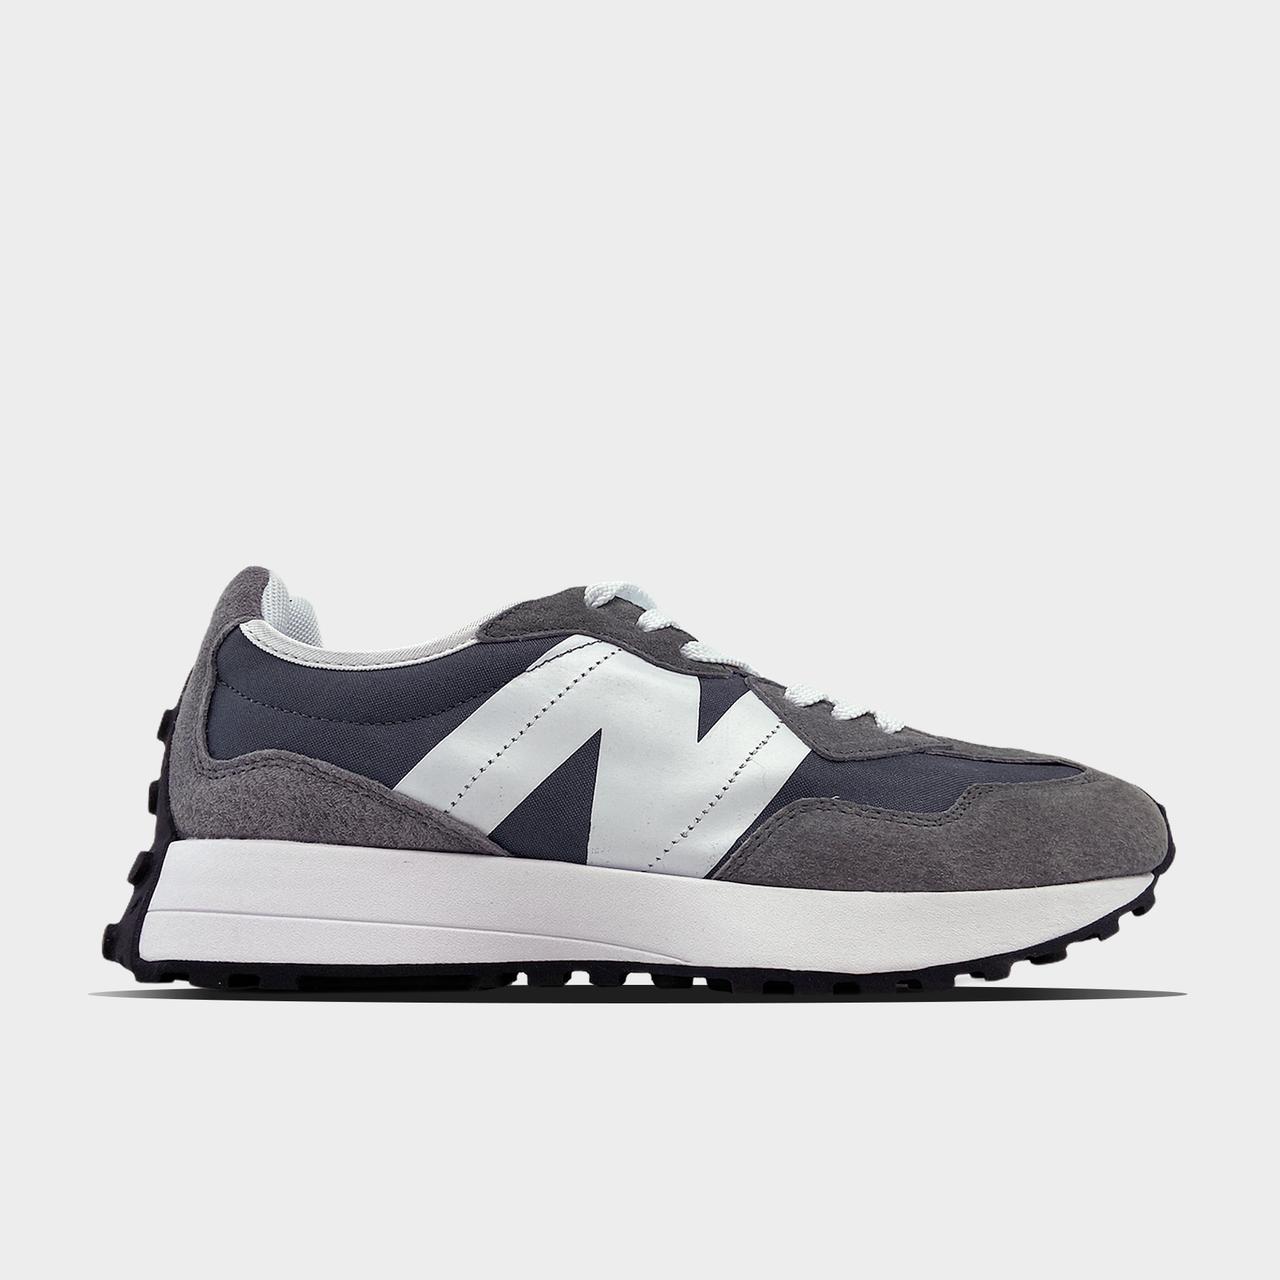 New Balance кроссовки, крос, обувь, взуття, sneakers, шузы, 327 Gray White (Серый)